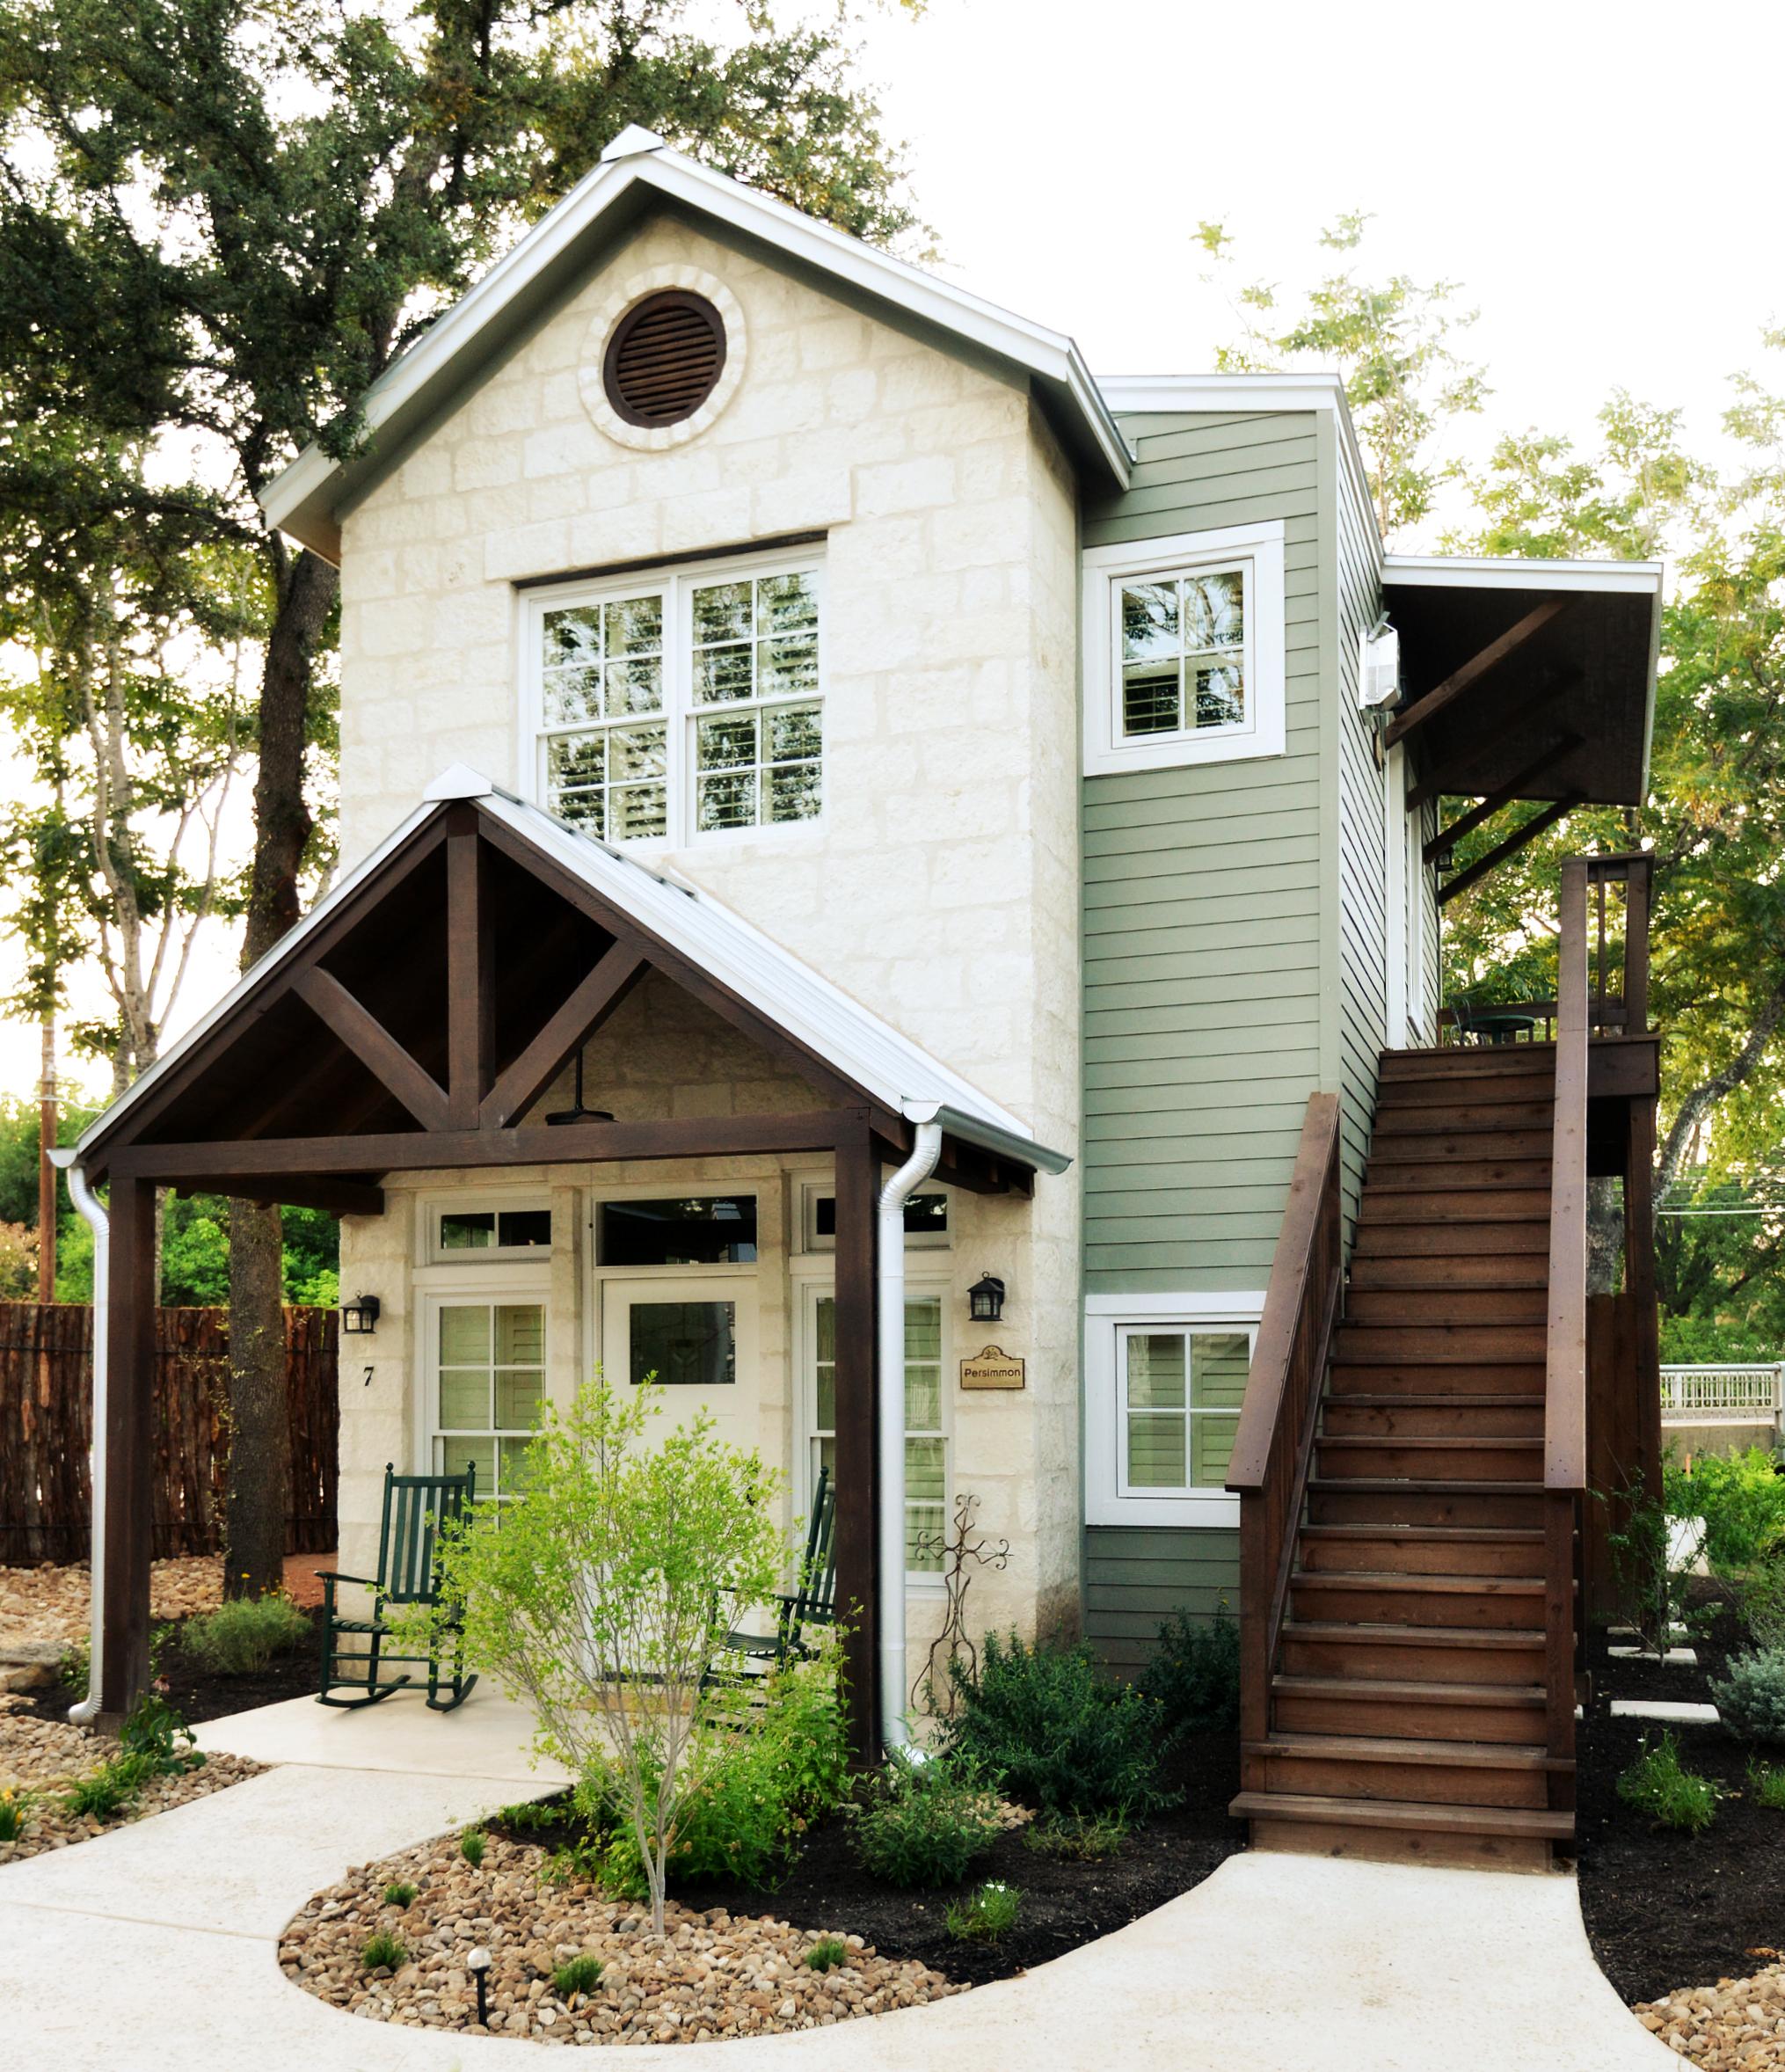 hillstar cottage | sugarberry inn bed & breakfastsugarberry inn